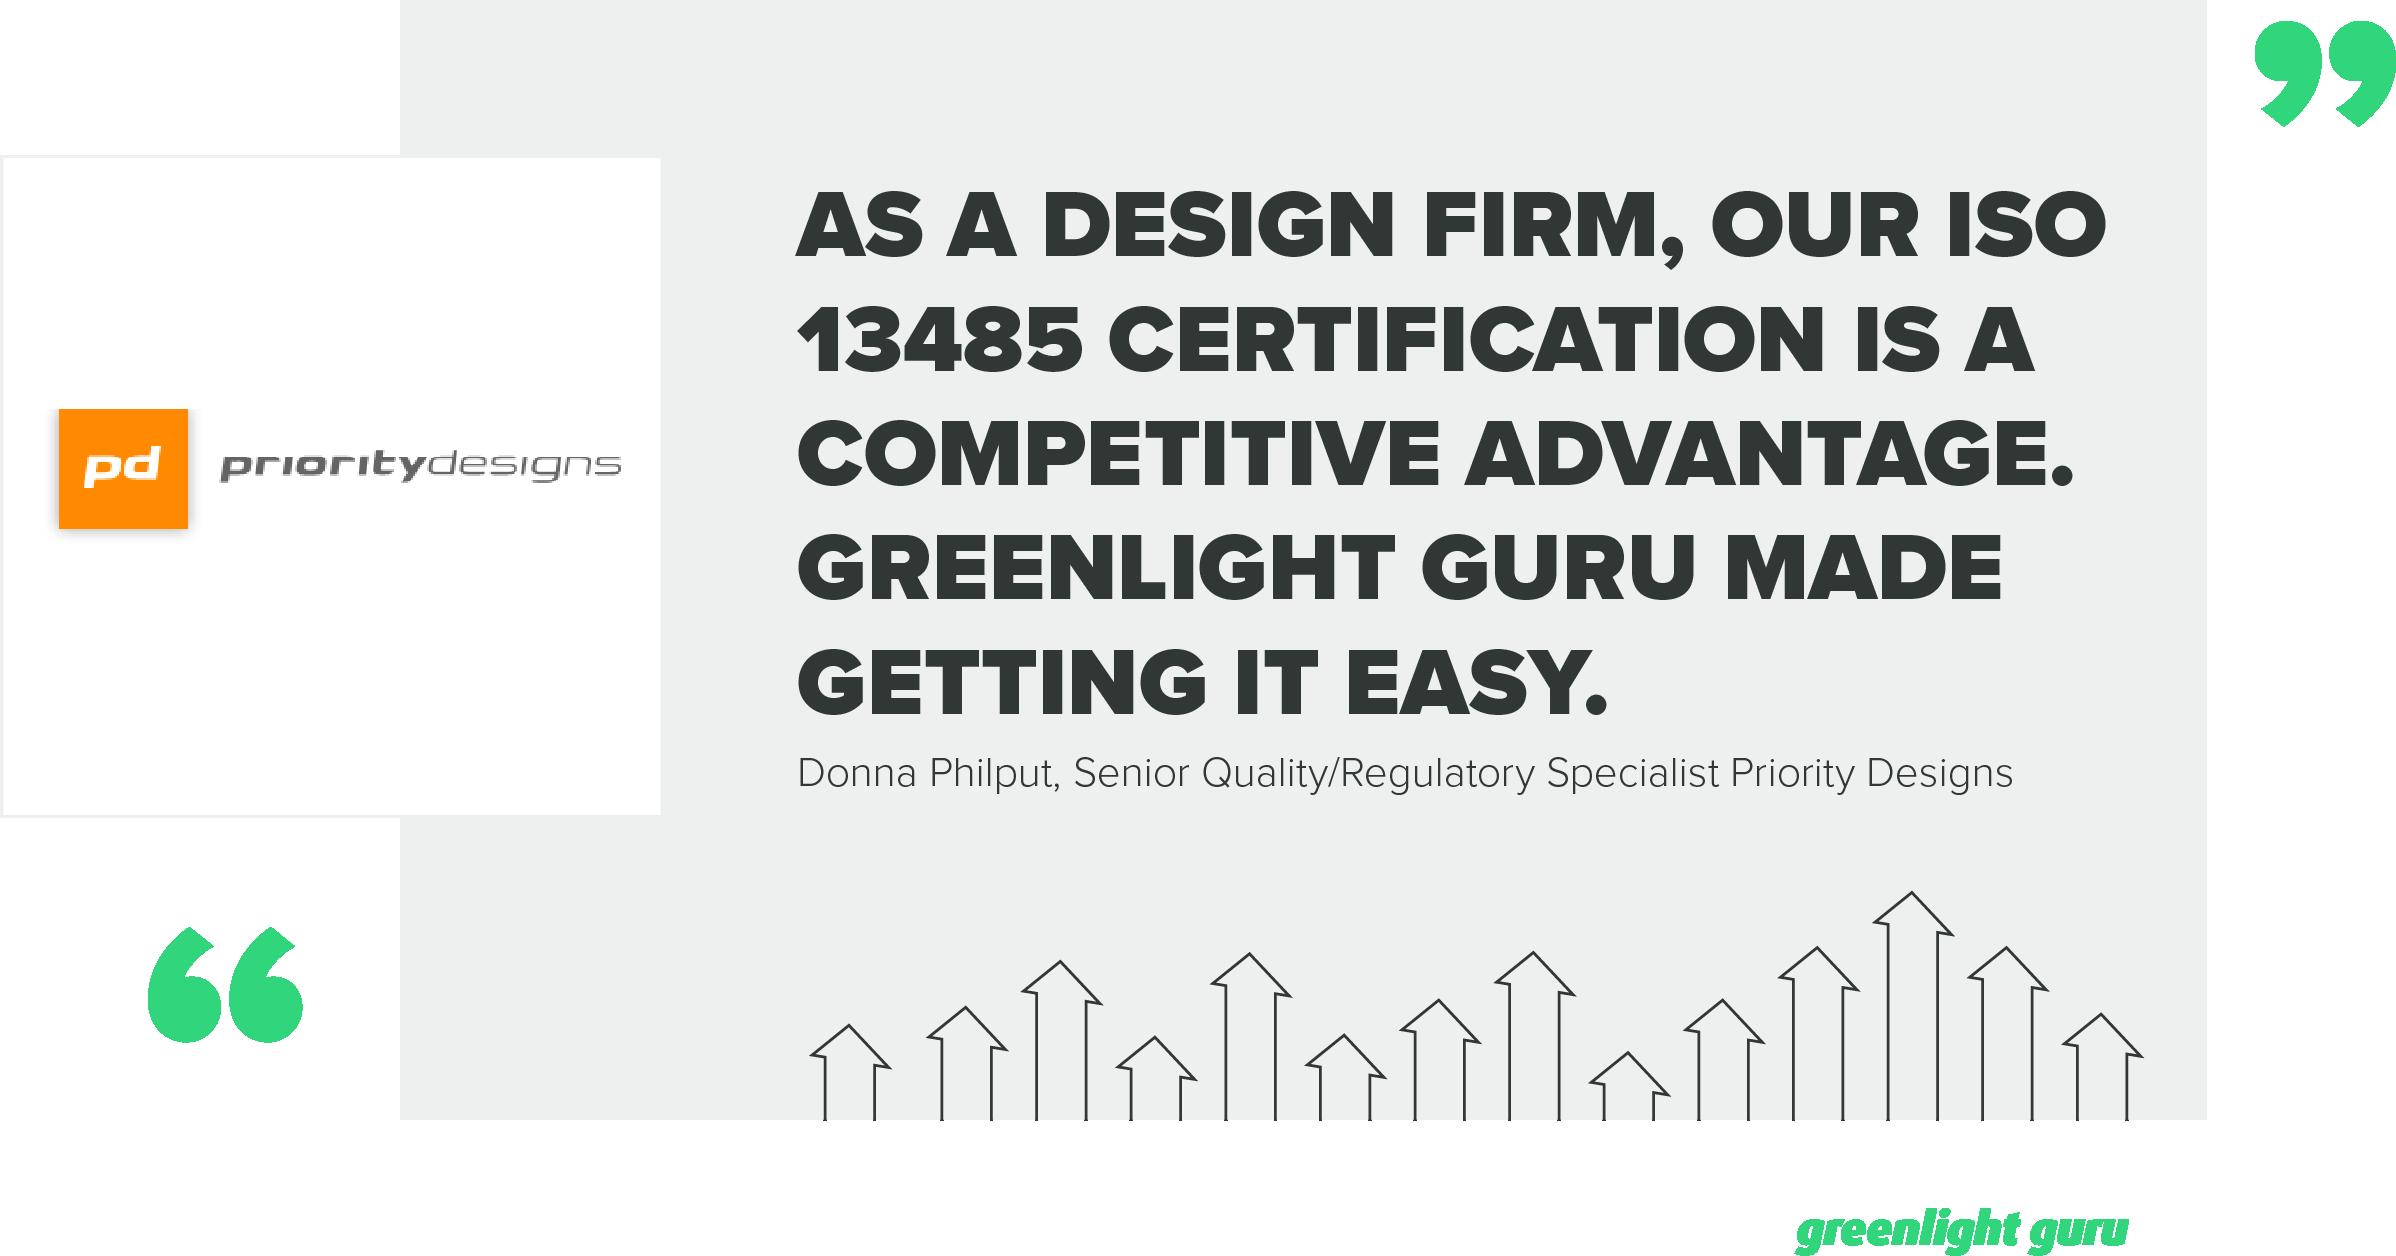 How Priority Designs Used Greenlight Guru To Gain Iso 134852016